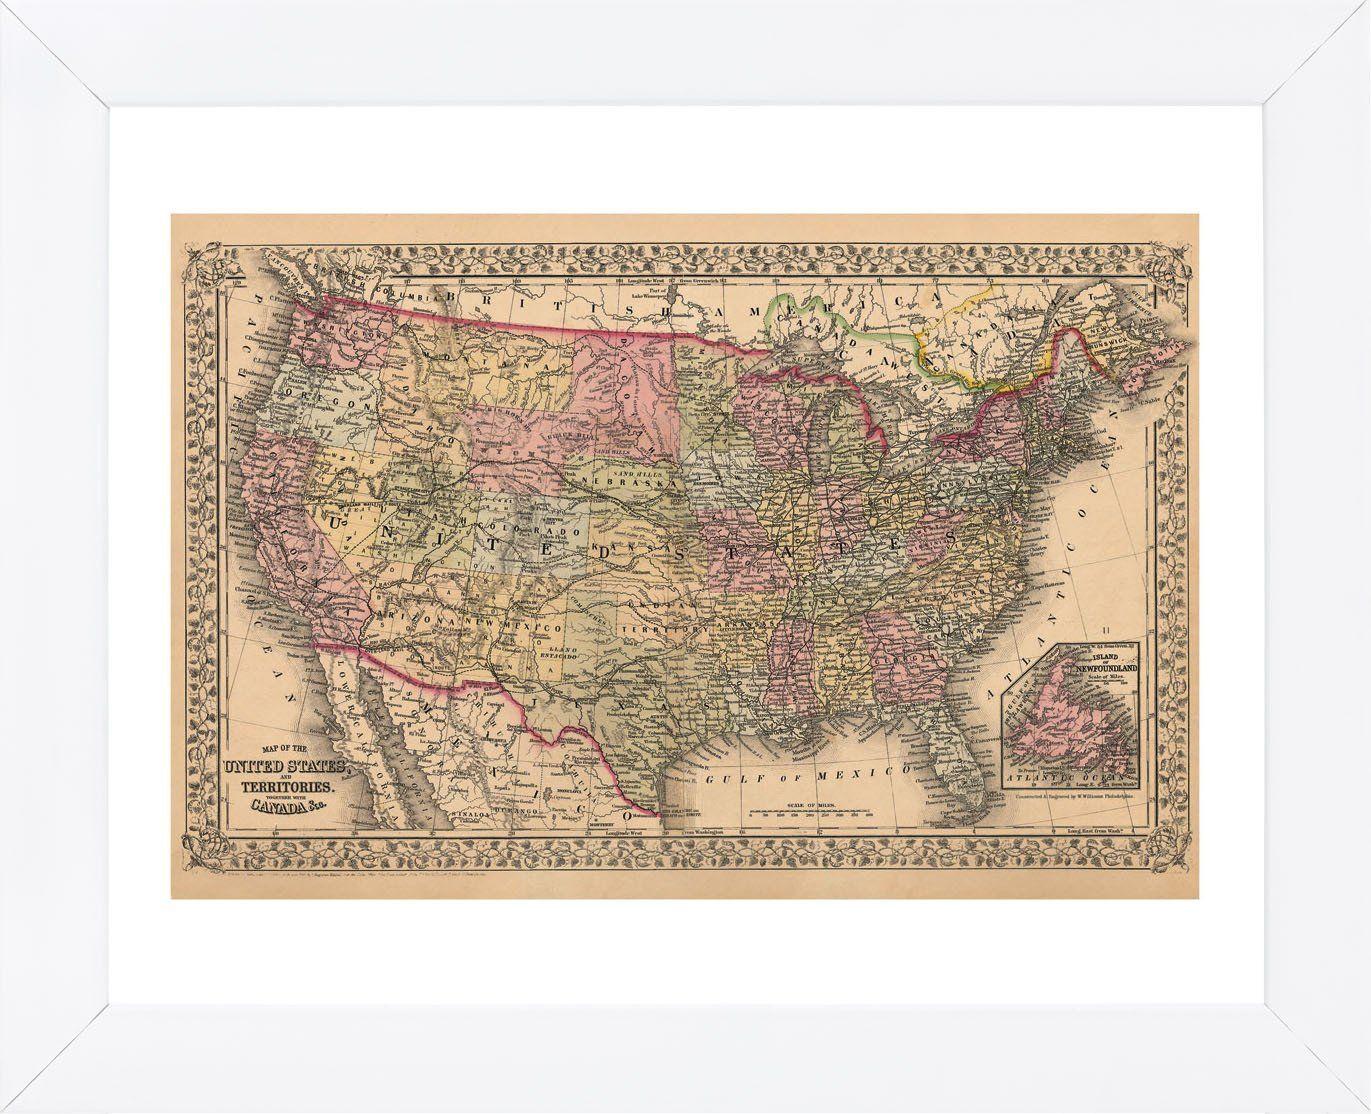 on framed map of united states